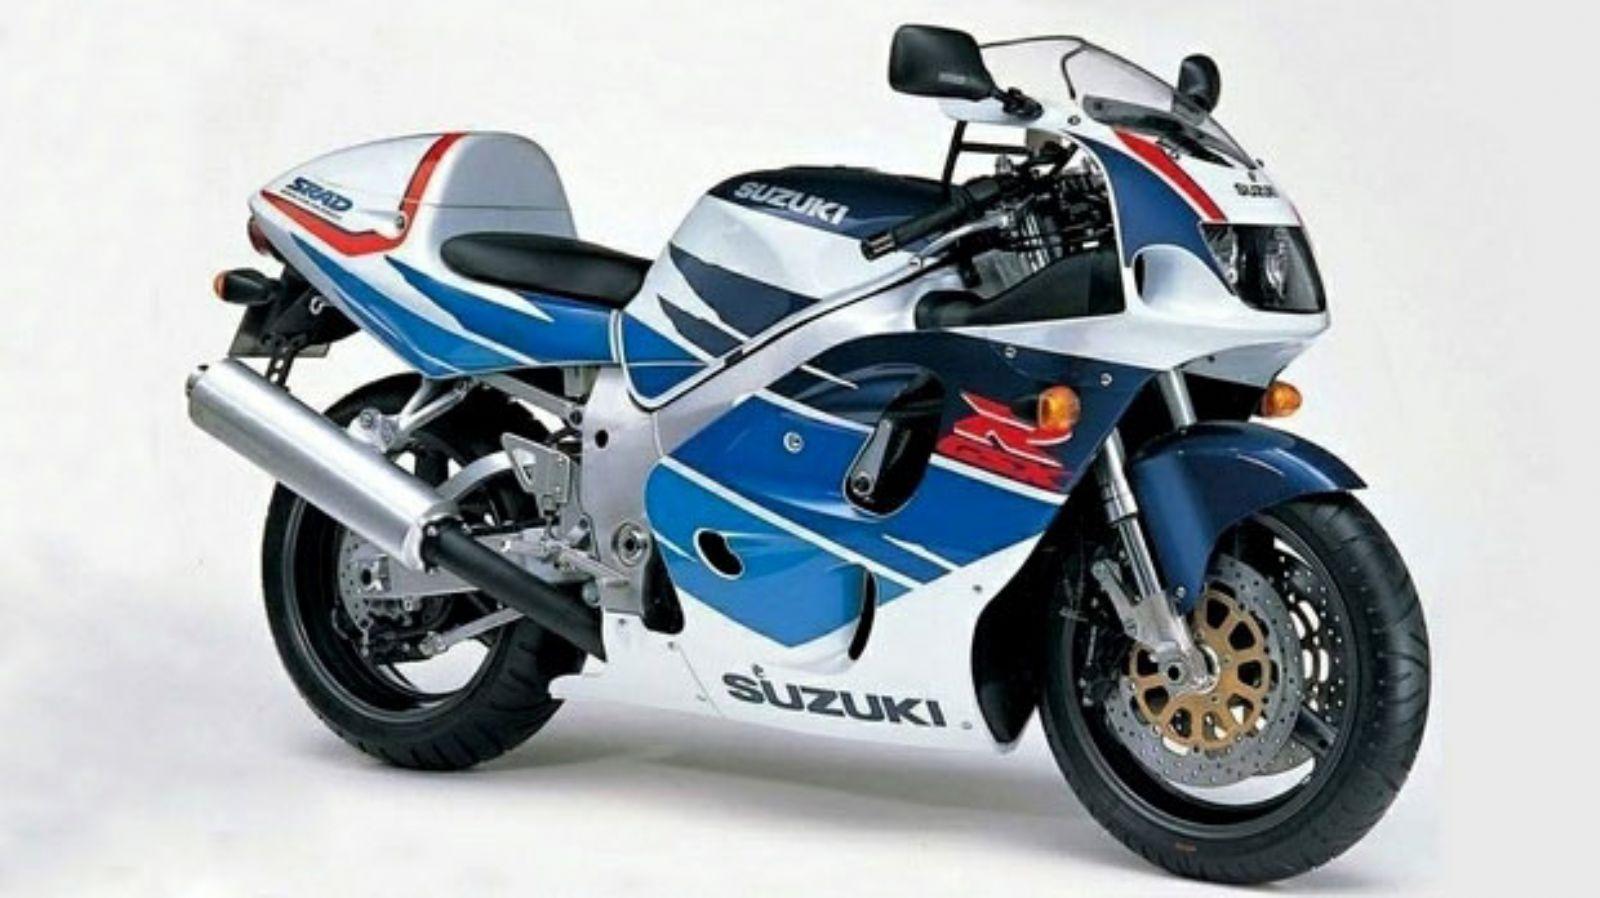 suzuki gsxr 750 srad service manual free download